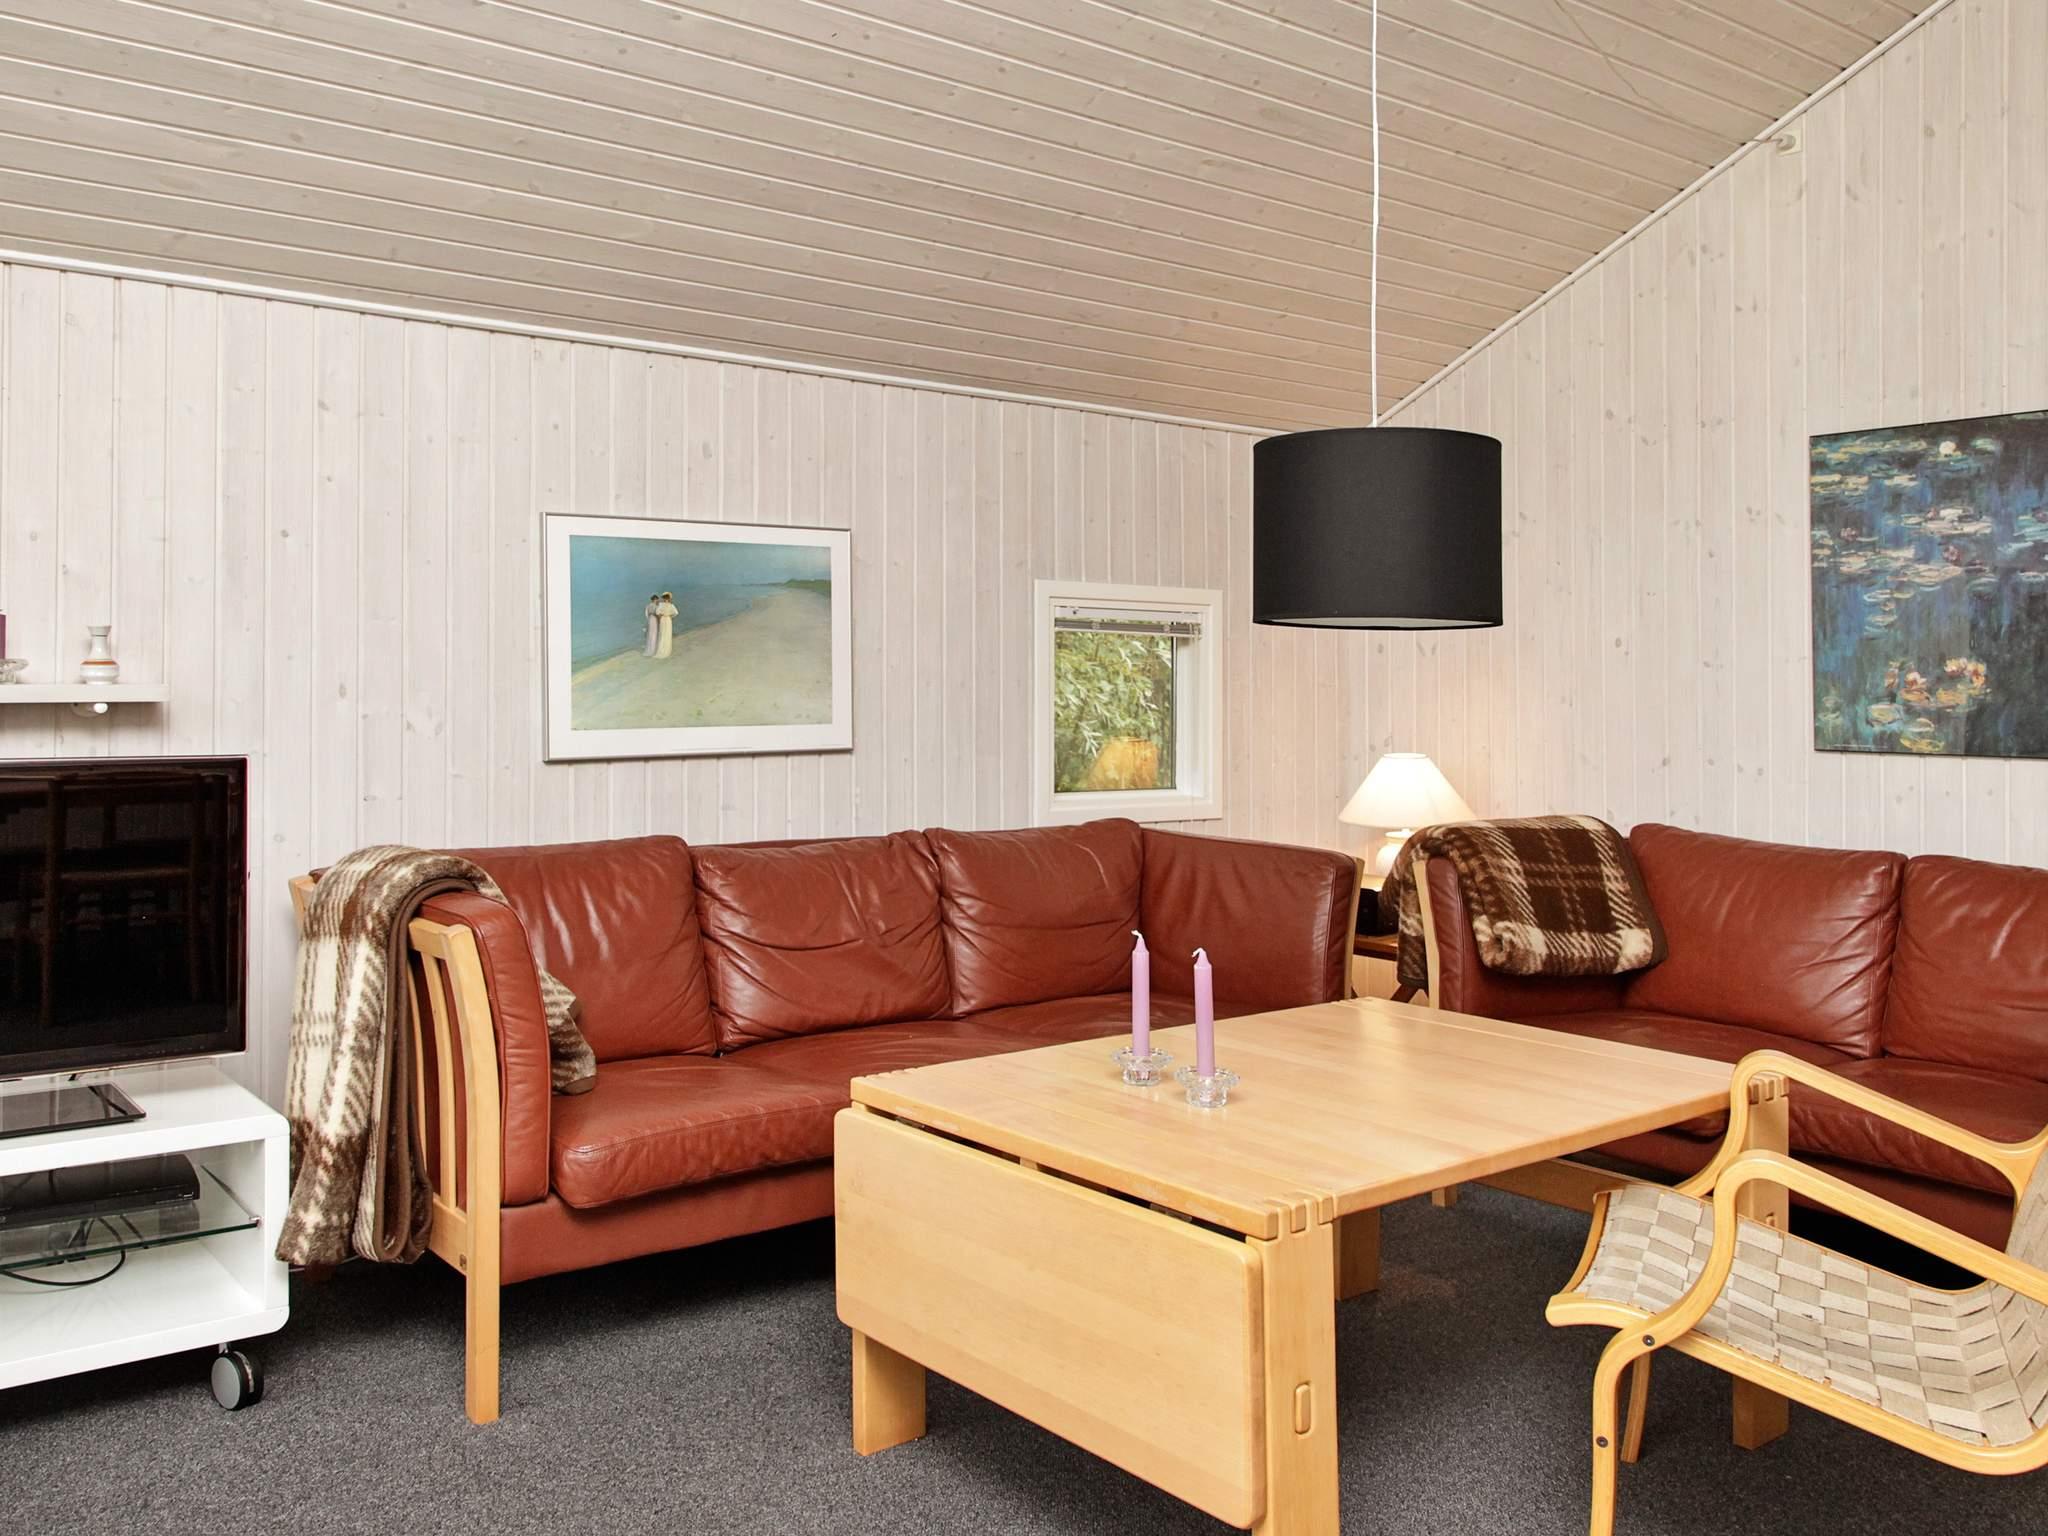 Ferienhaus Ristinge (125632), Ristinge, , Langeland, Dänemark, Bild 6